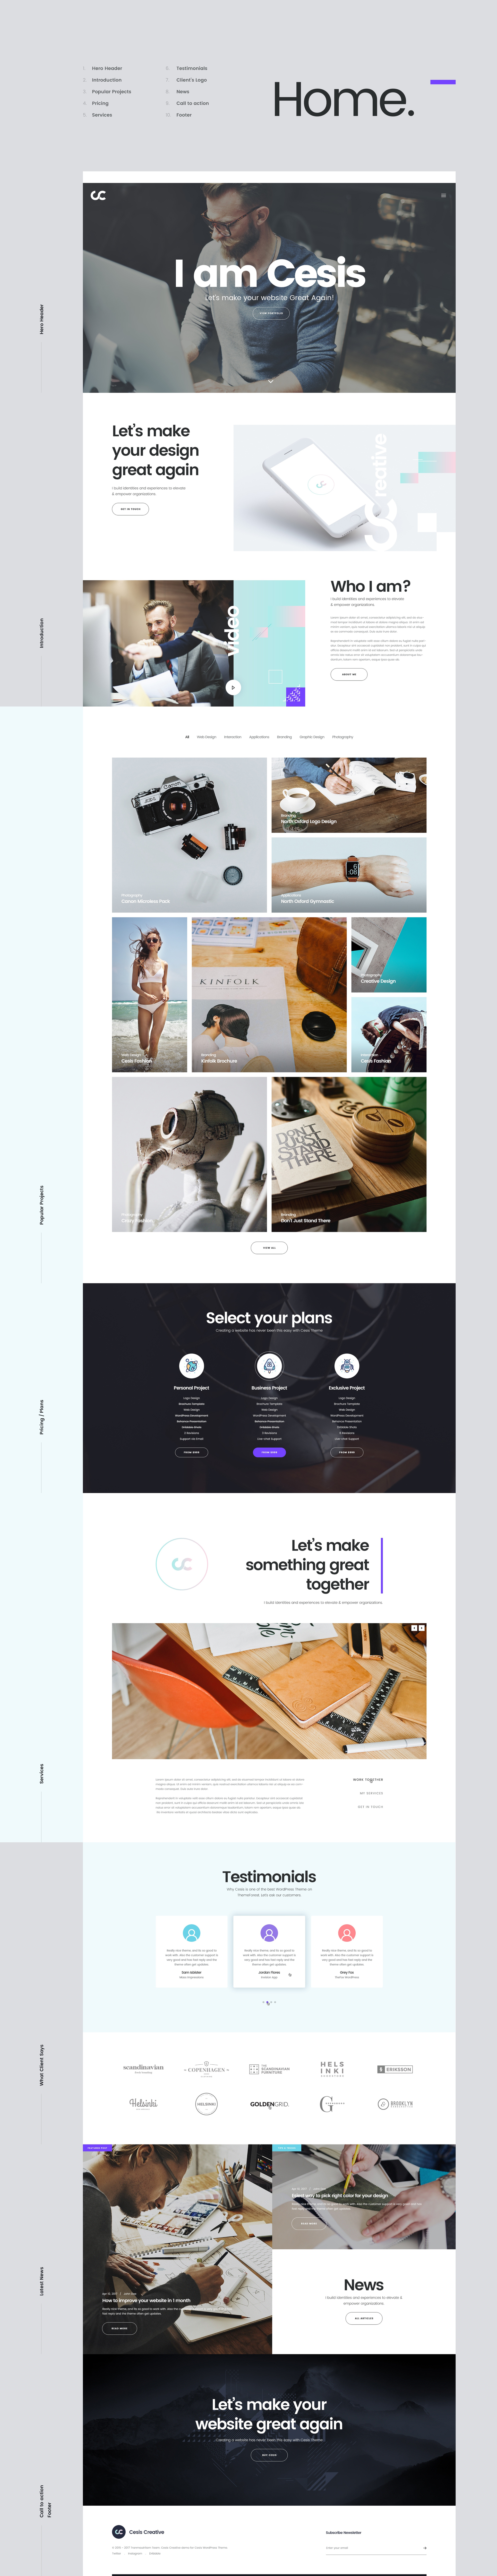 Behance 03   homepage